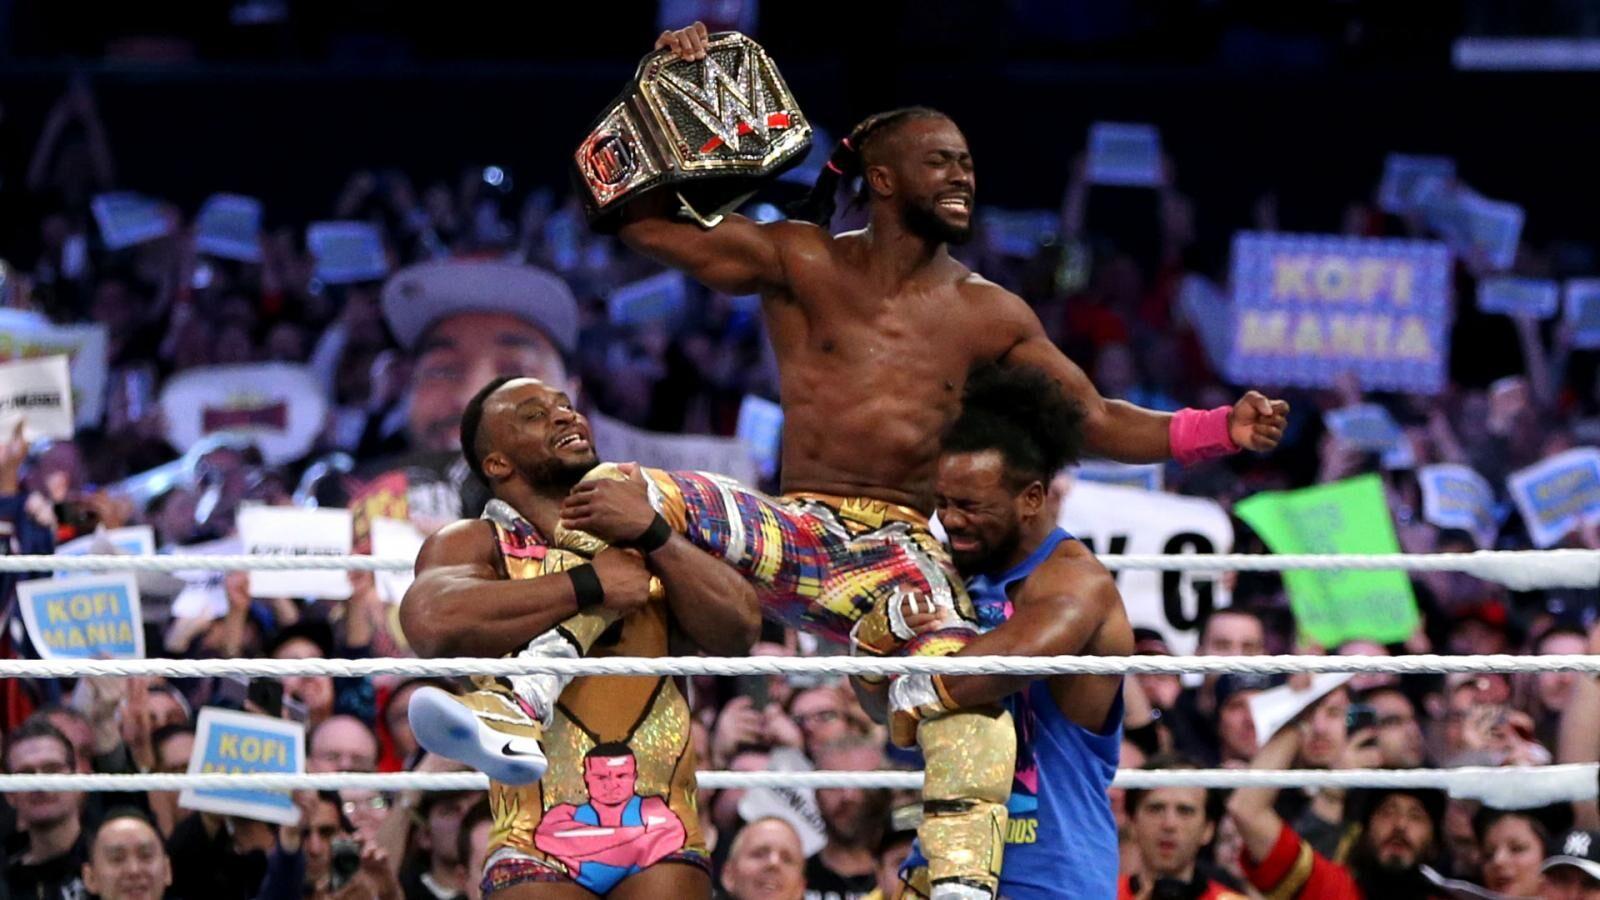 WWE SmackDown: The slaying of Kofi Kingston sends the wrong message